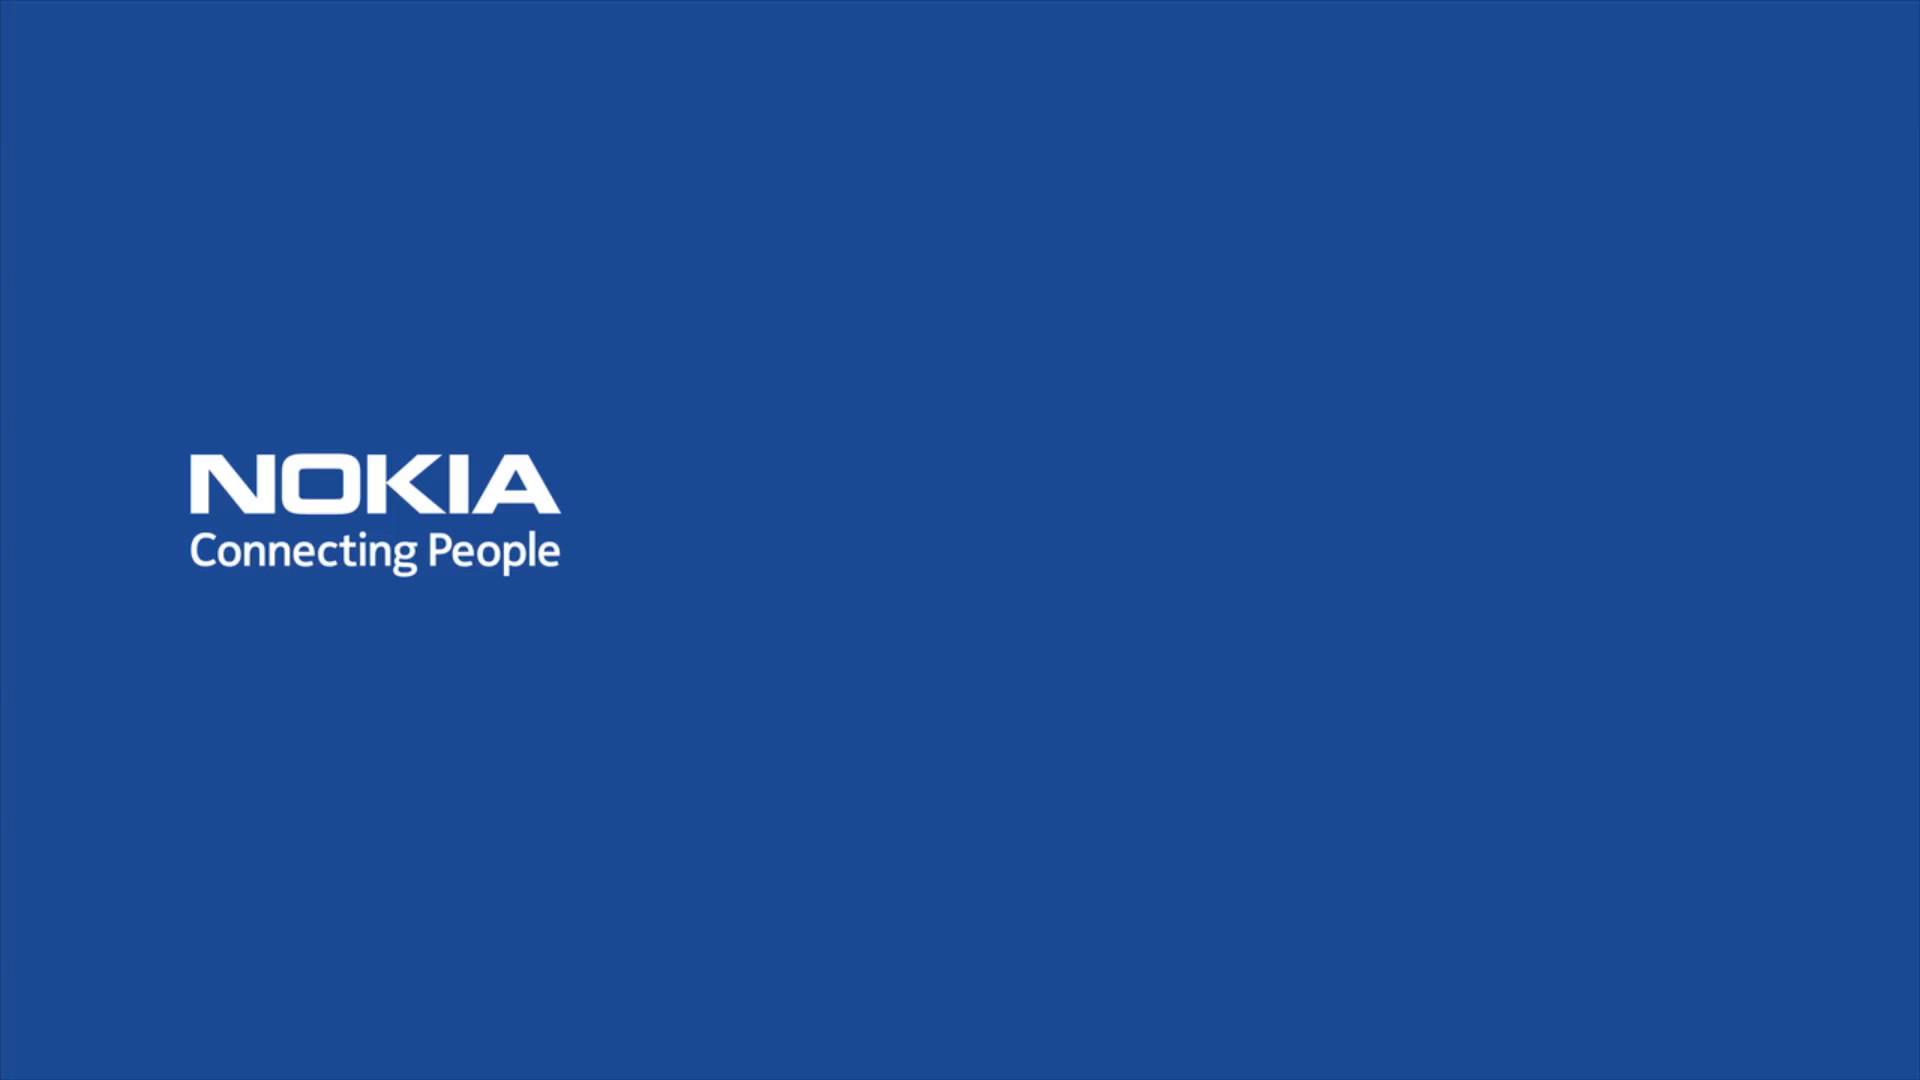 Nokia Wallpaper Logos 36 images 1920x1080